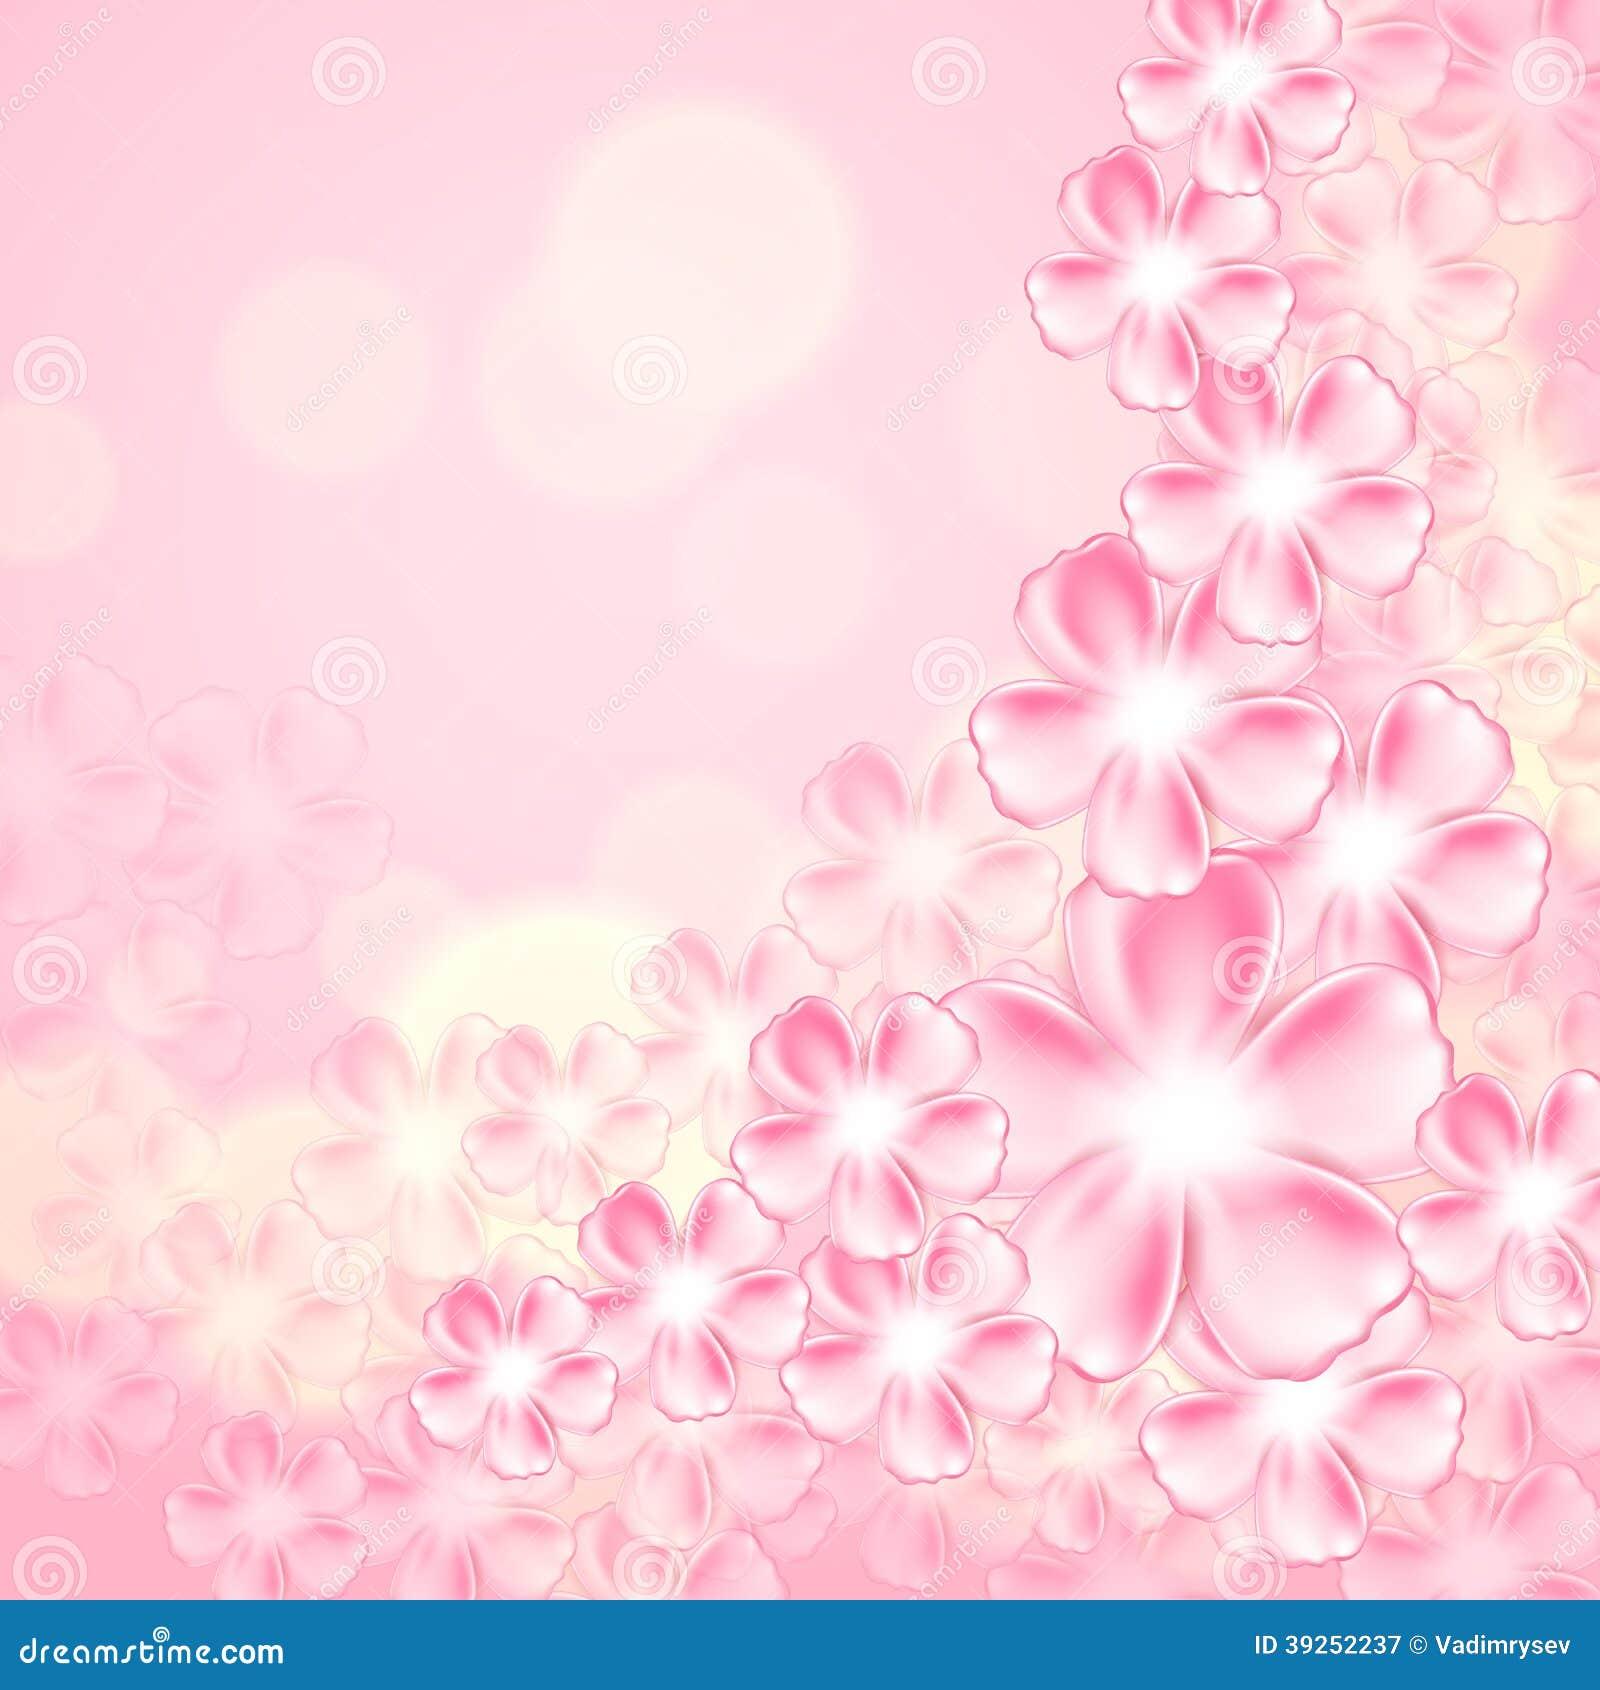 beautiful pink flower background wwwpixsharkcom